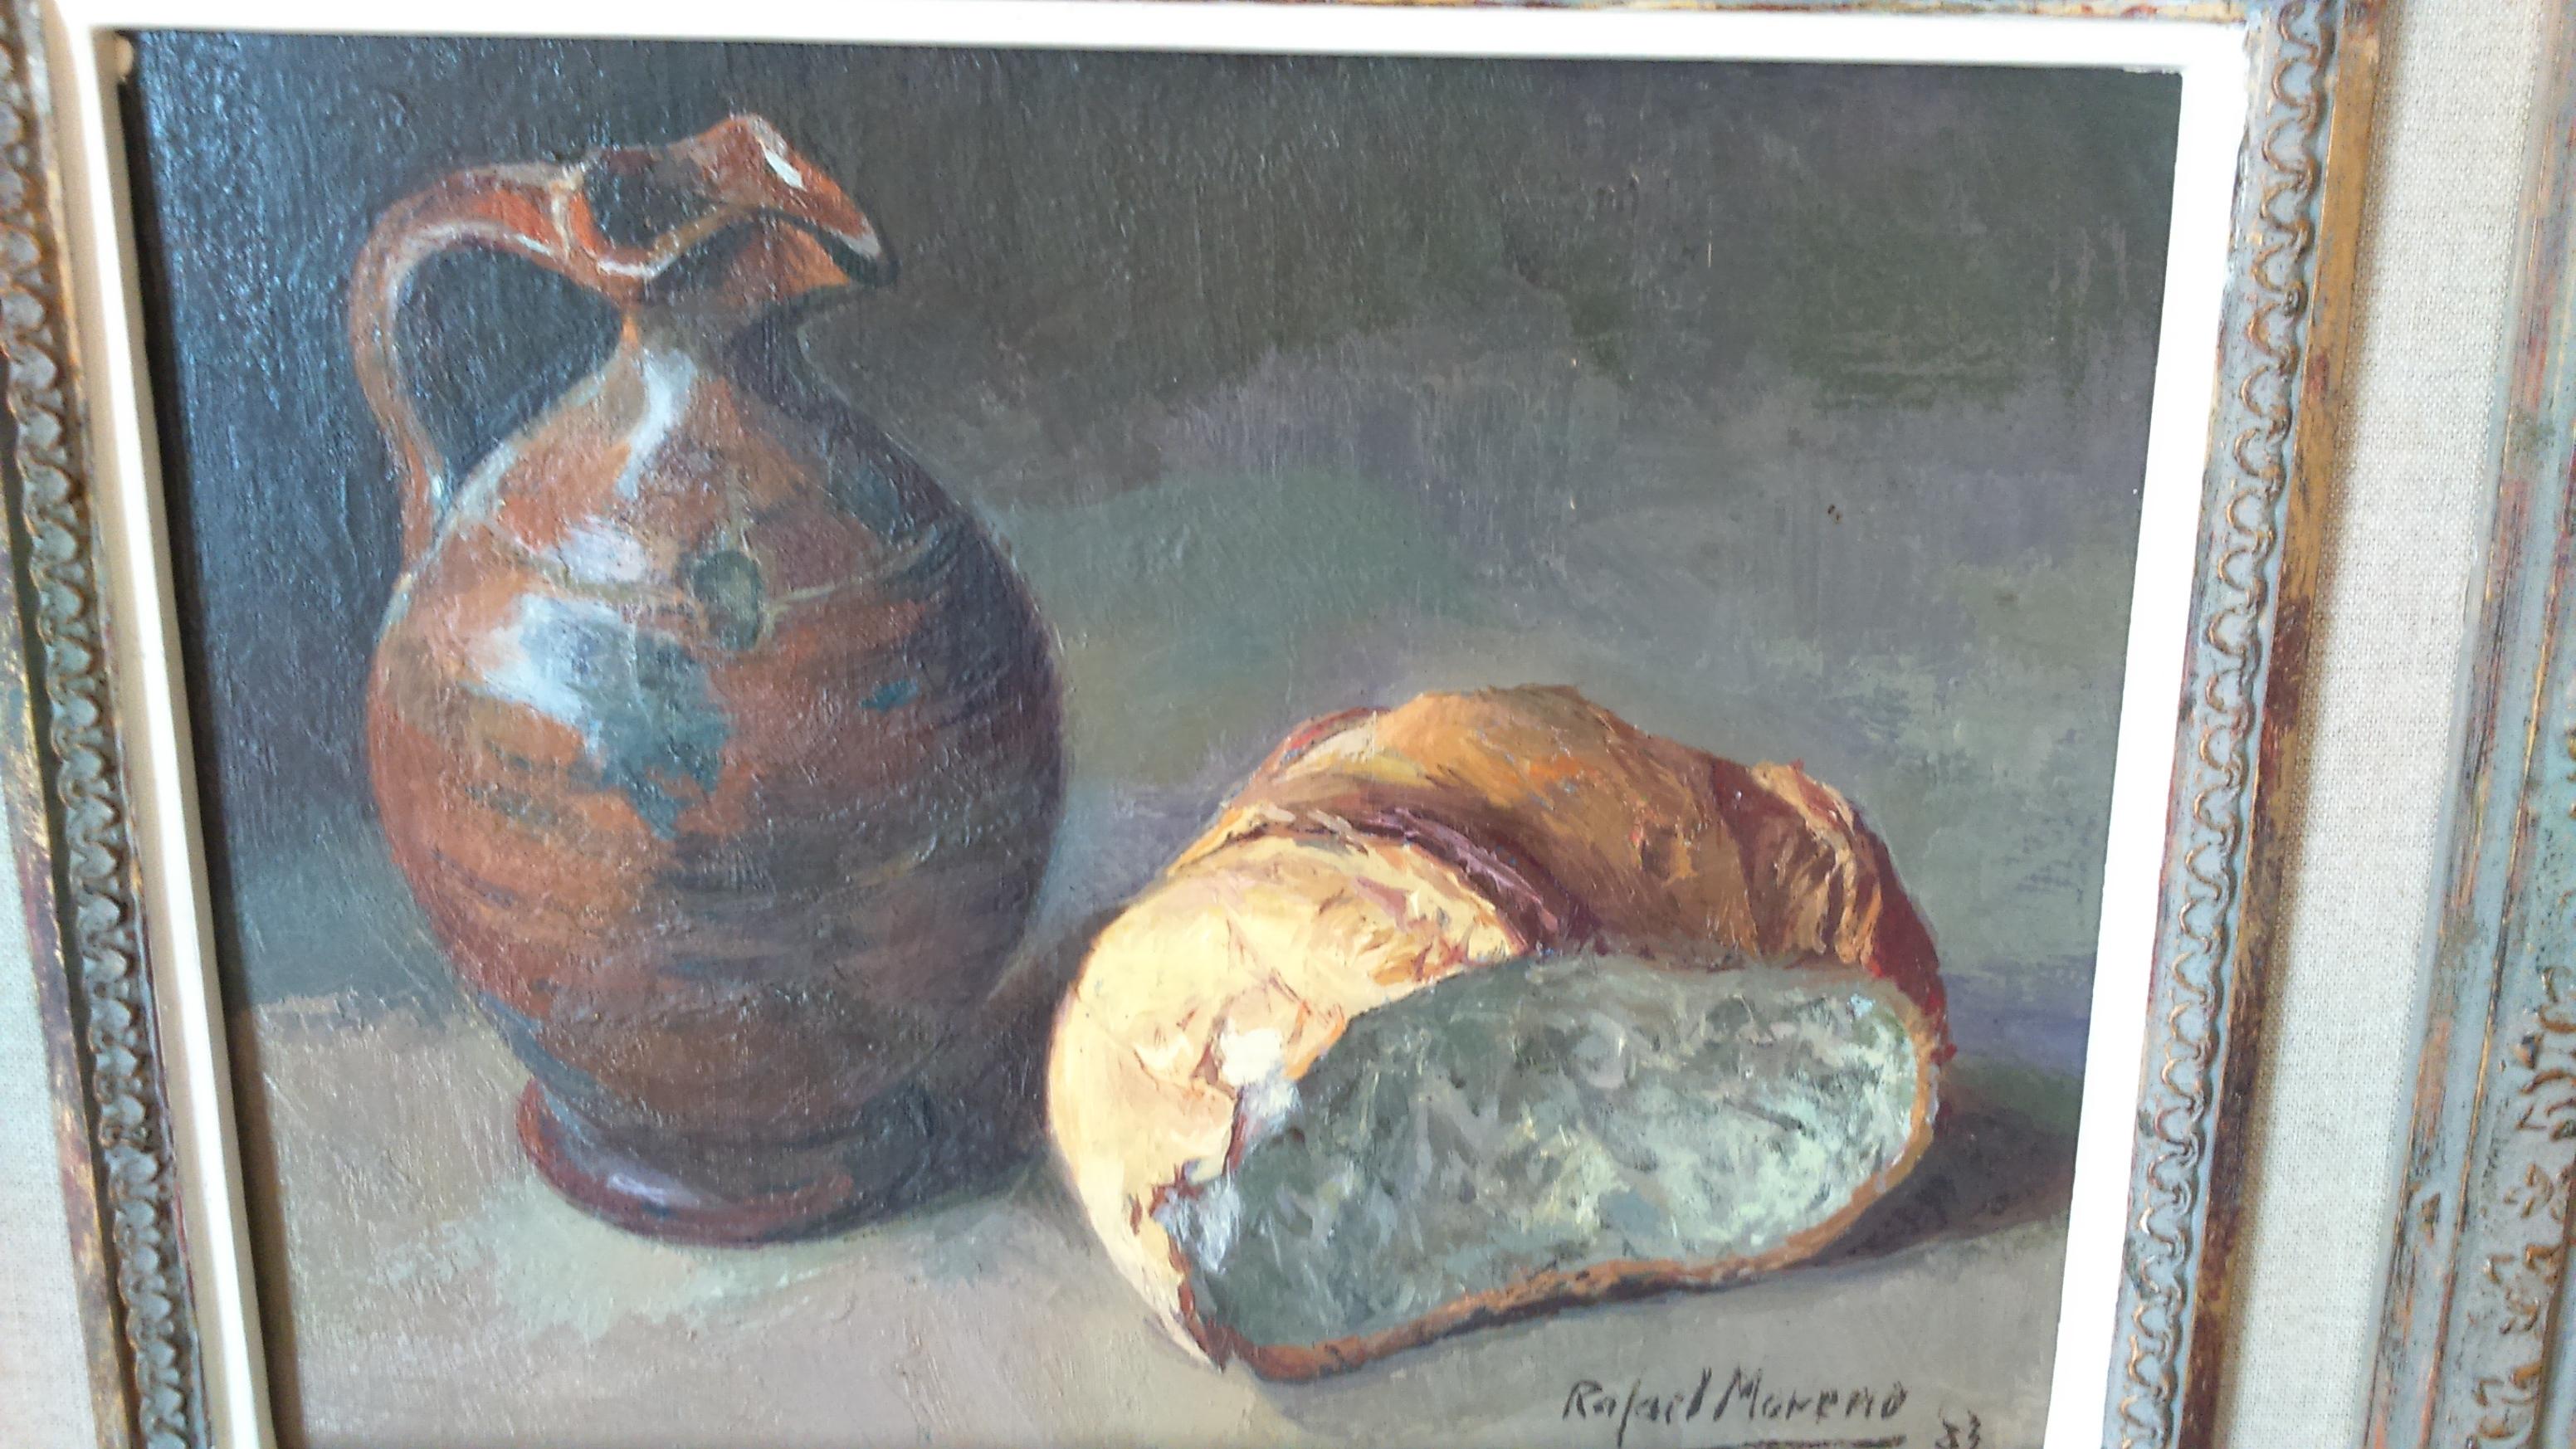 Rafael Moreno Oil on canvas